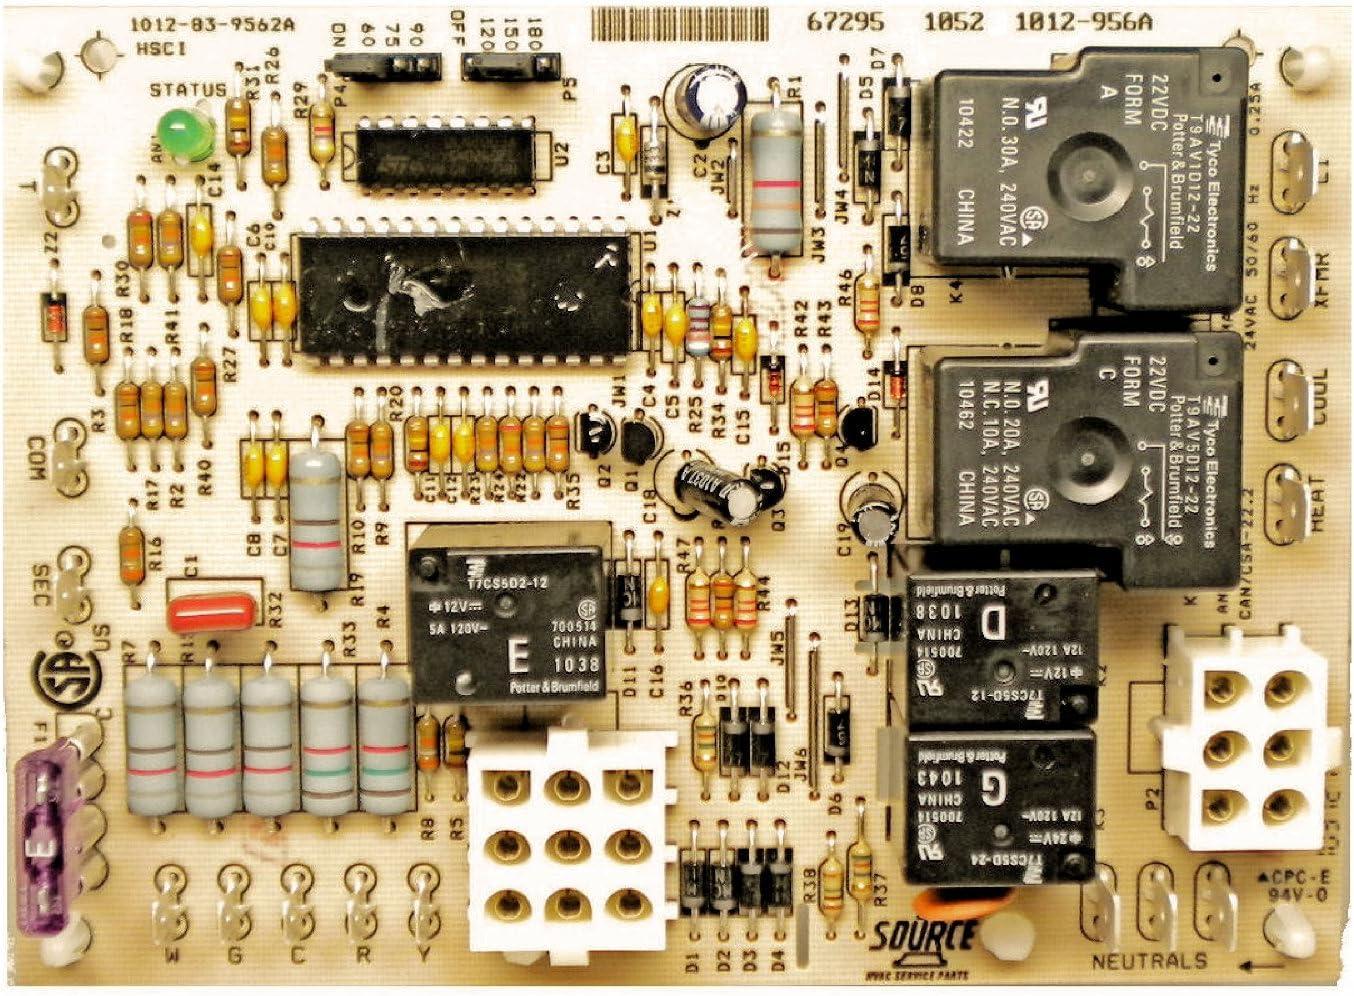 7956-319P Max 79% OFF - Ranking TOP12 Coleman OEM Furnace Panel Control Circuit Board